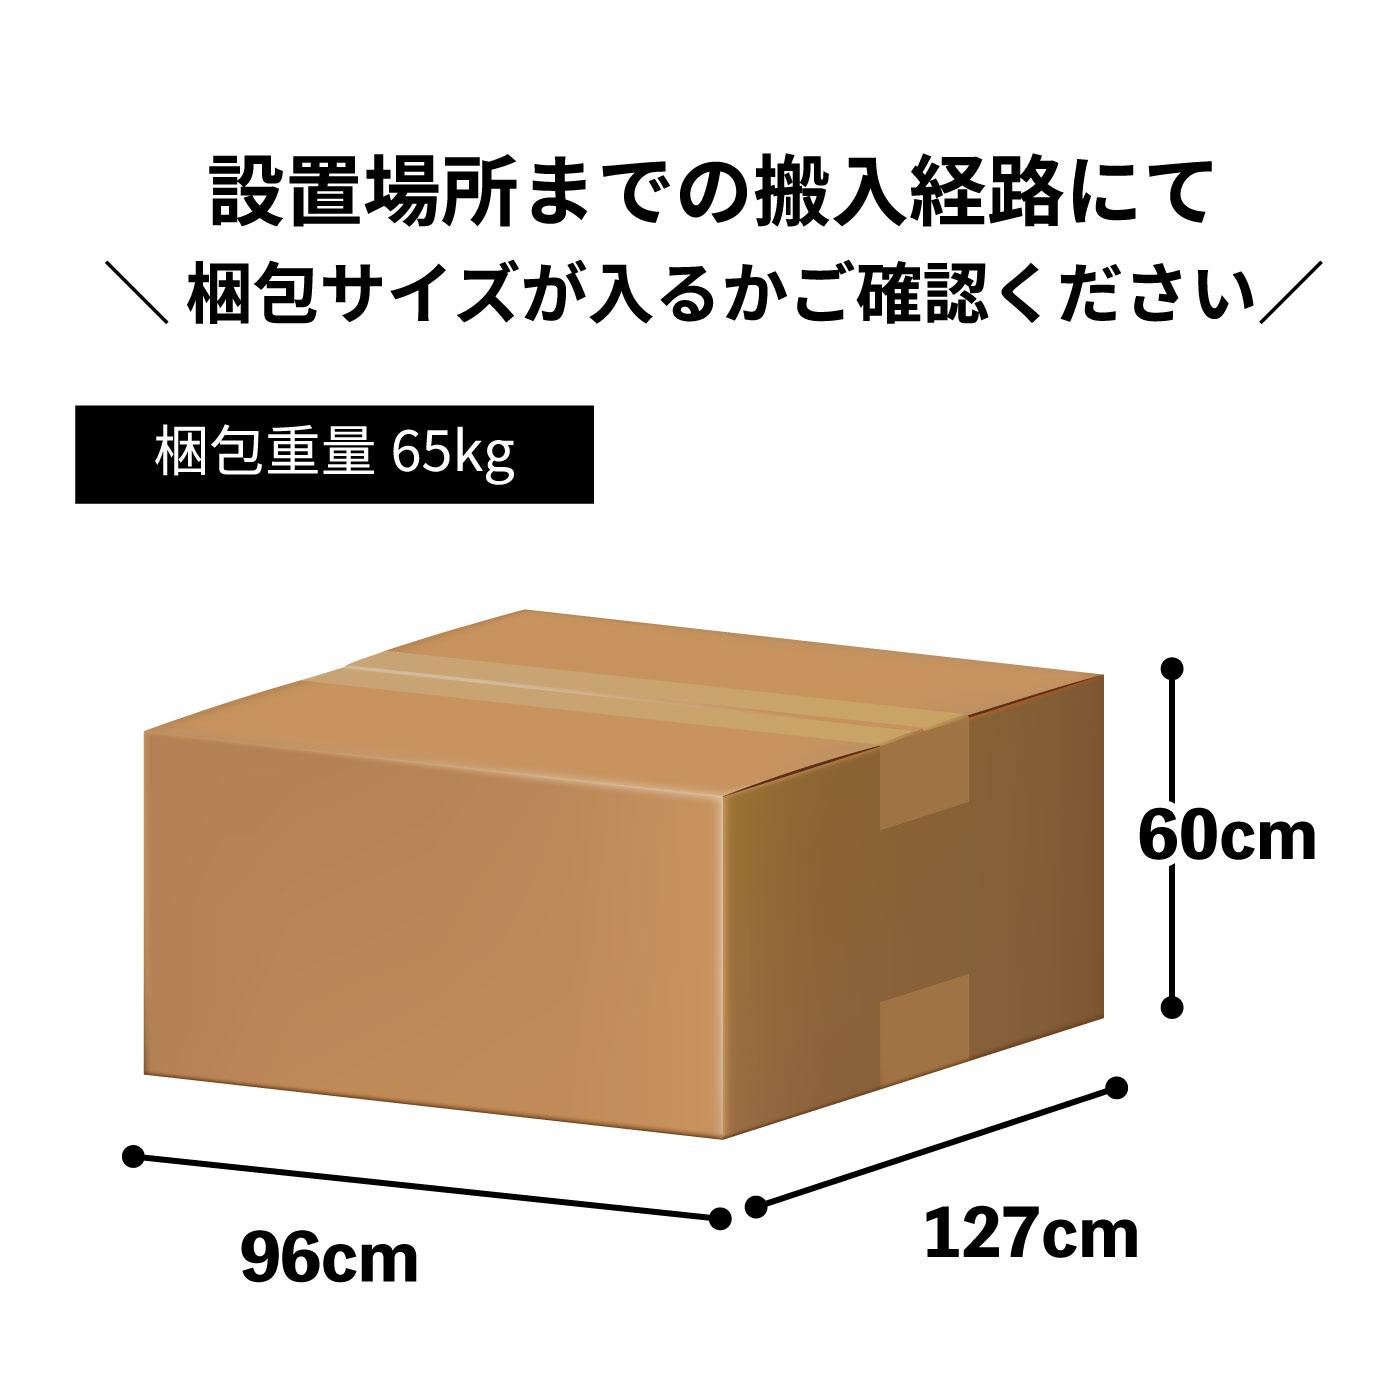 DK-1204の梱包サイズ